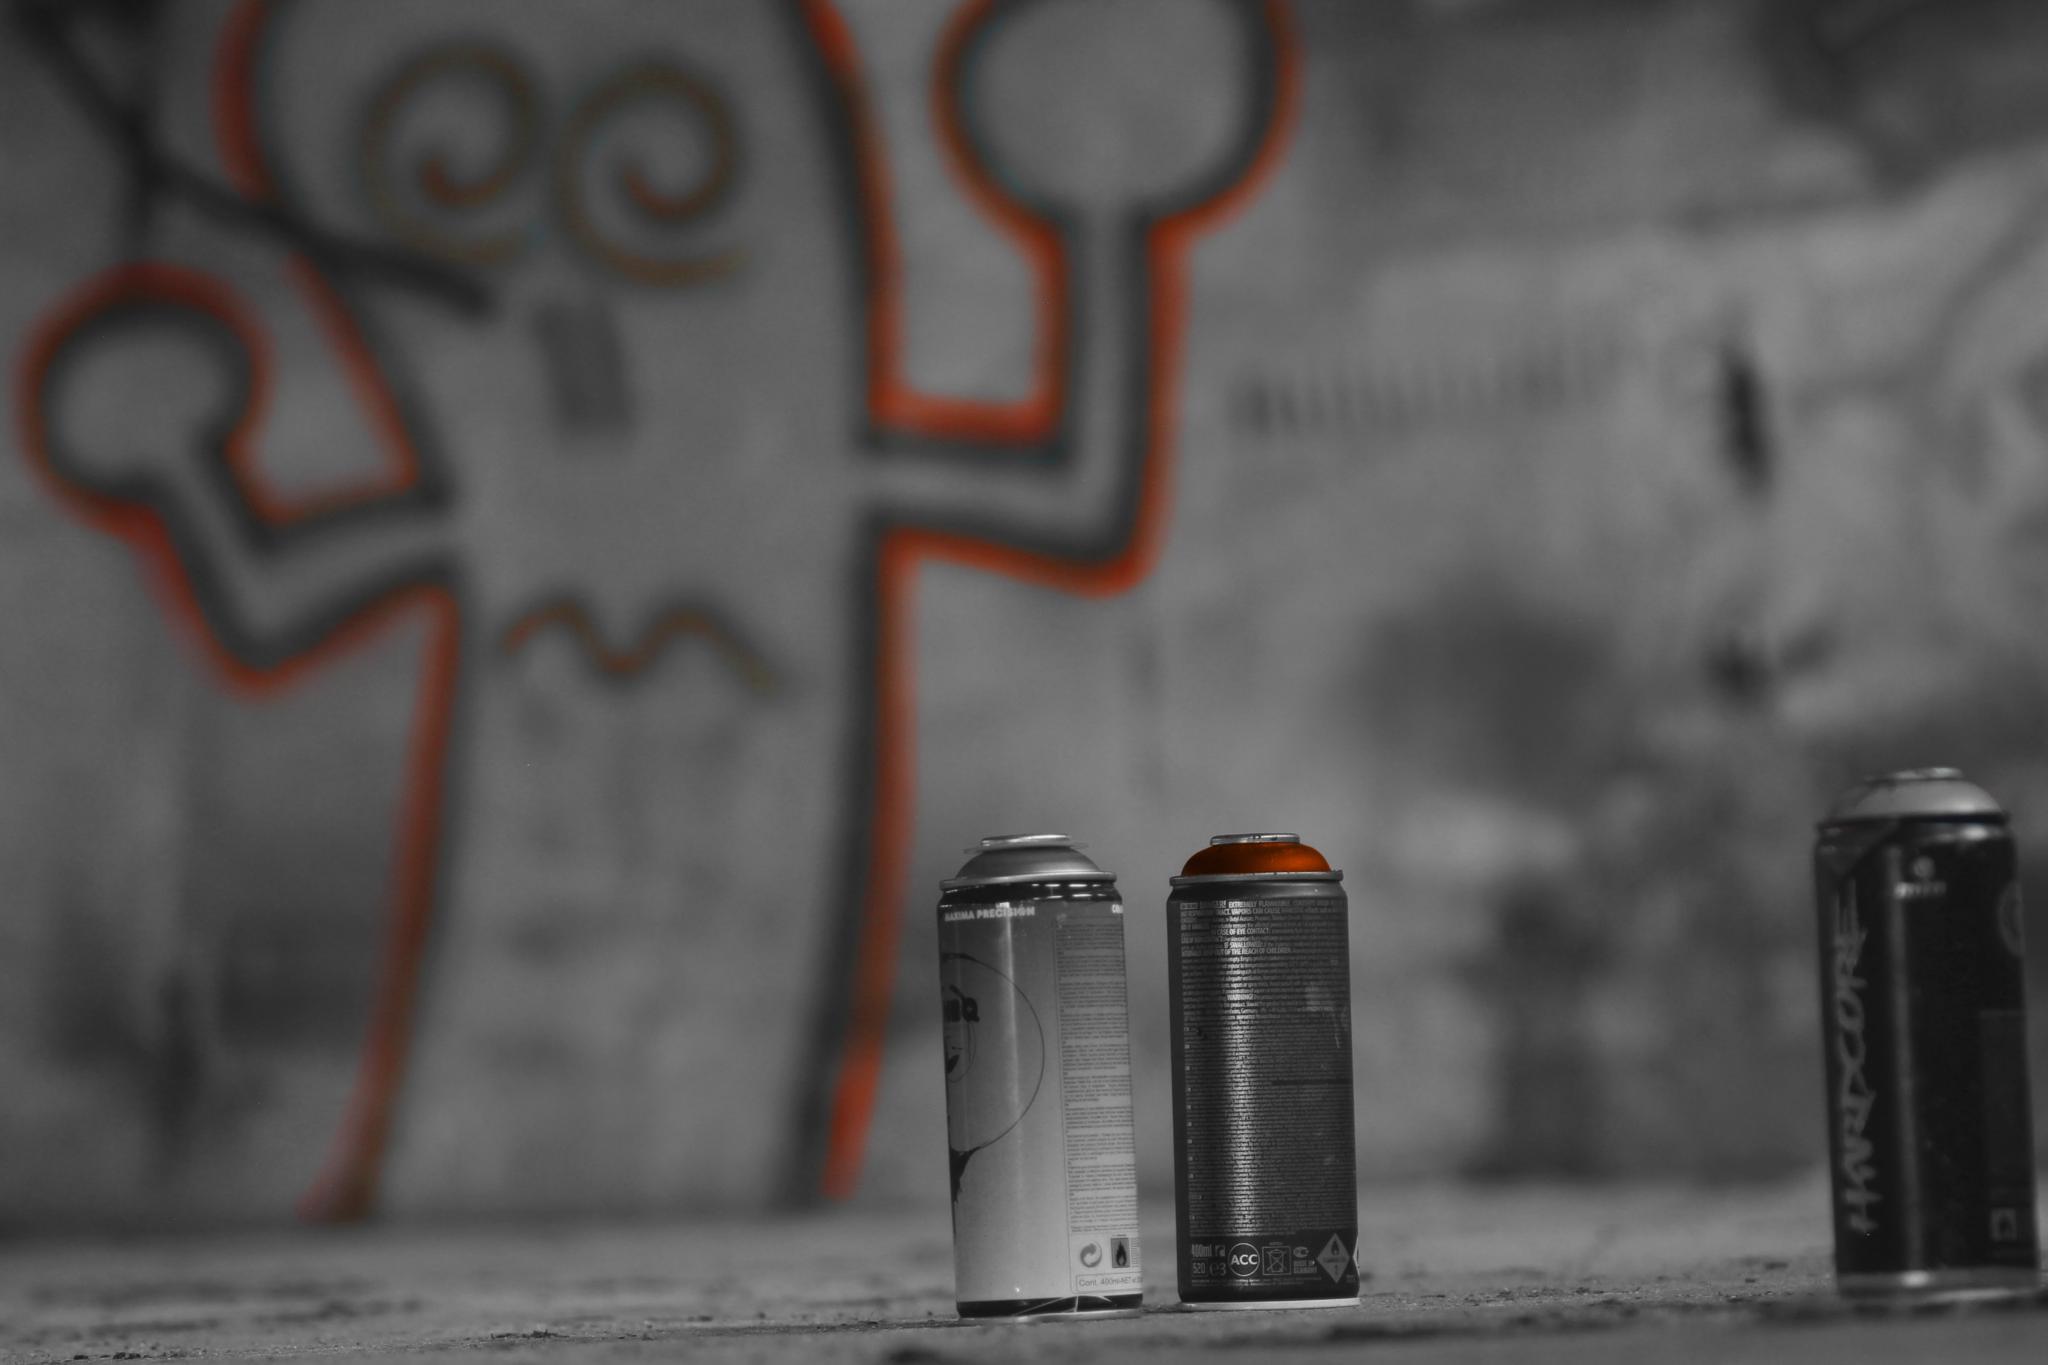 Sprayer by thomashaage